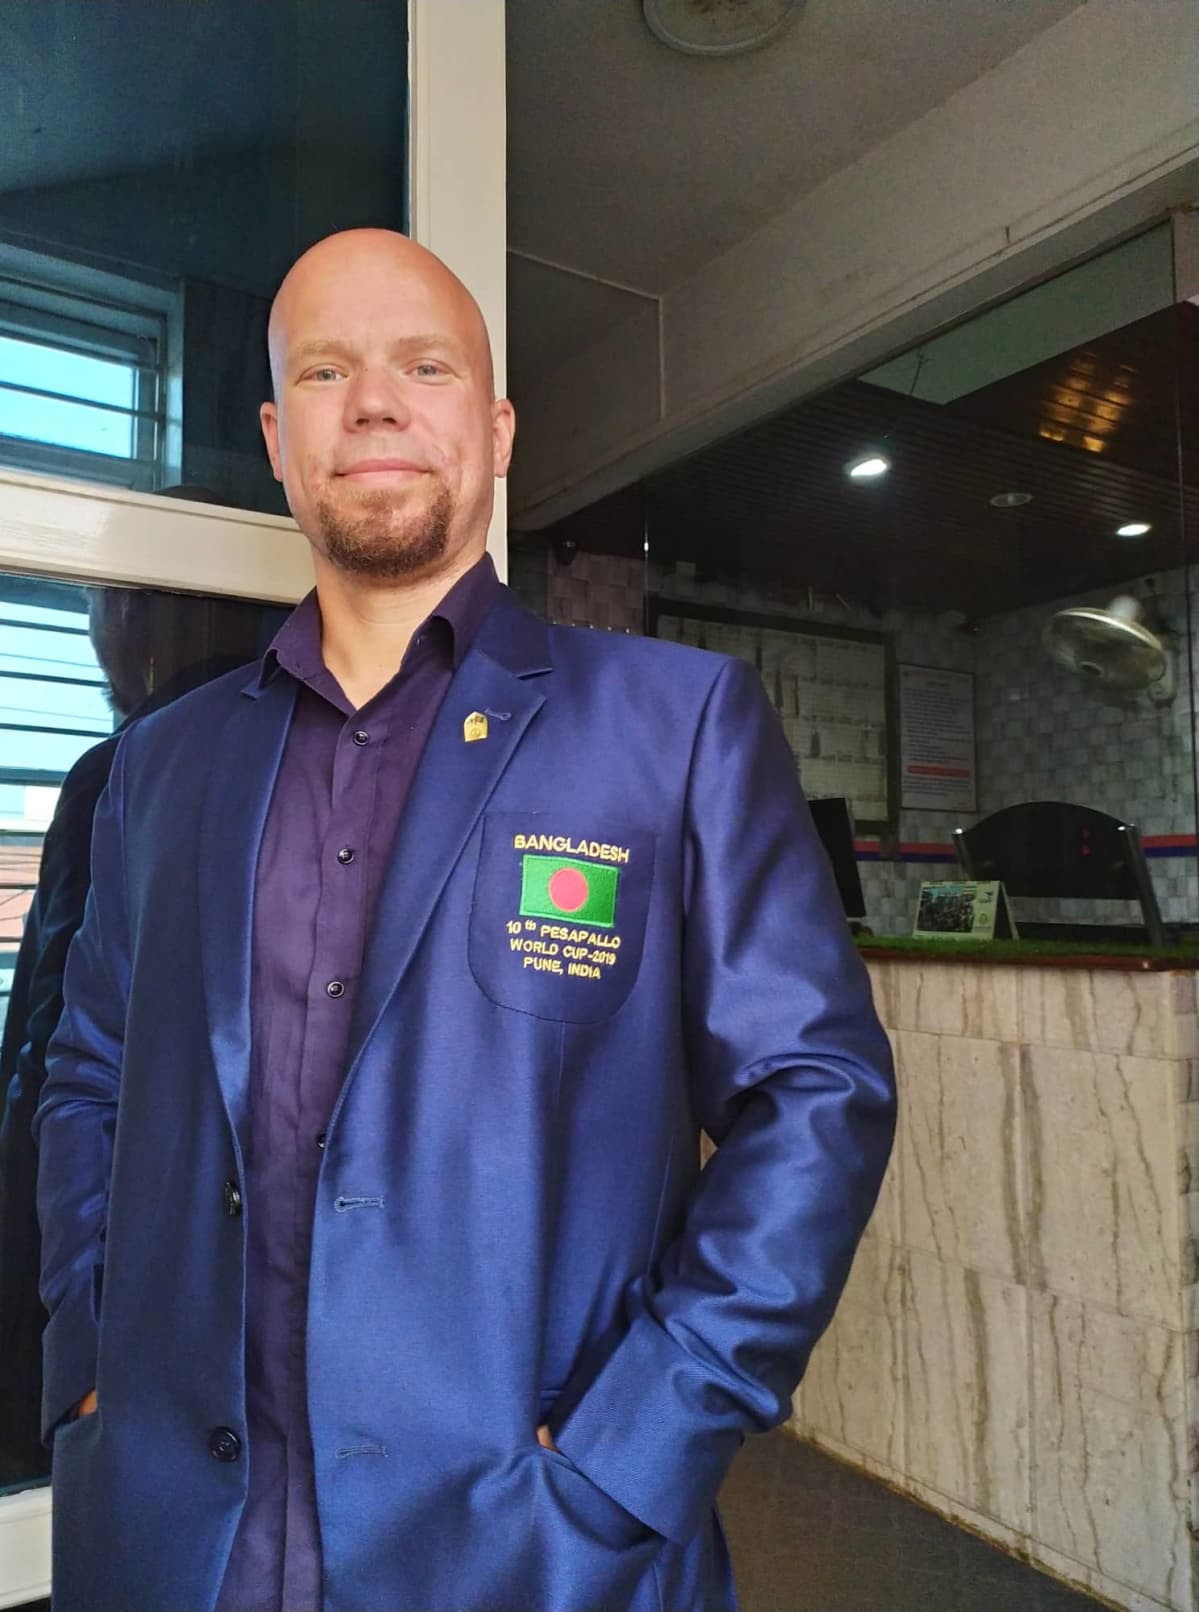 Pesäpallovalmentaja Mikko Pirhonen Bangladeshissa.